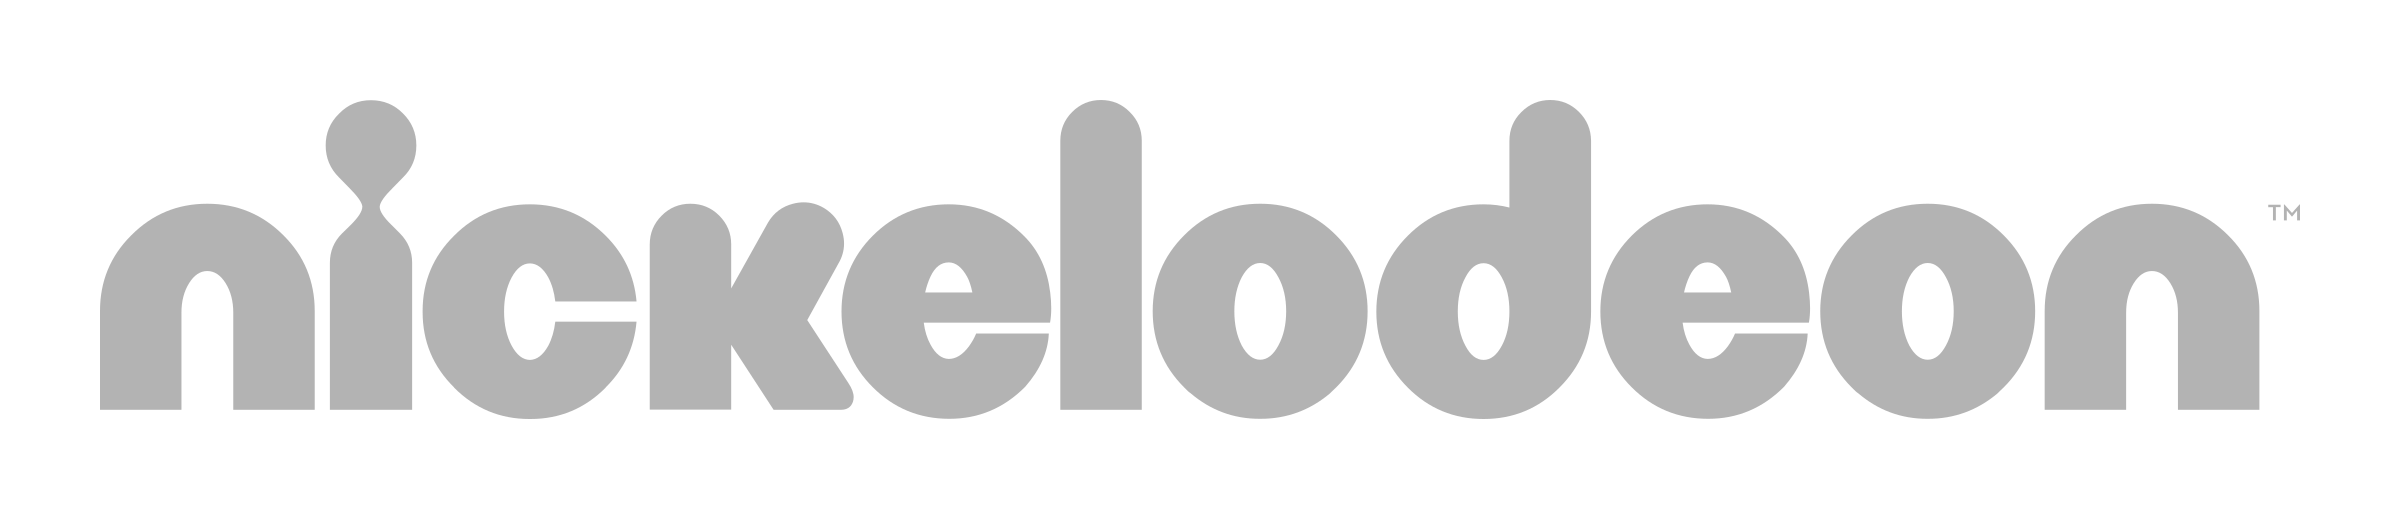 nickelodeon-logo-png-transparent.png